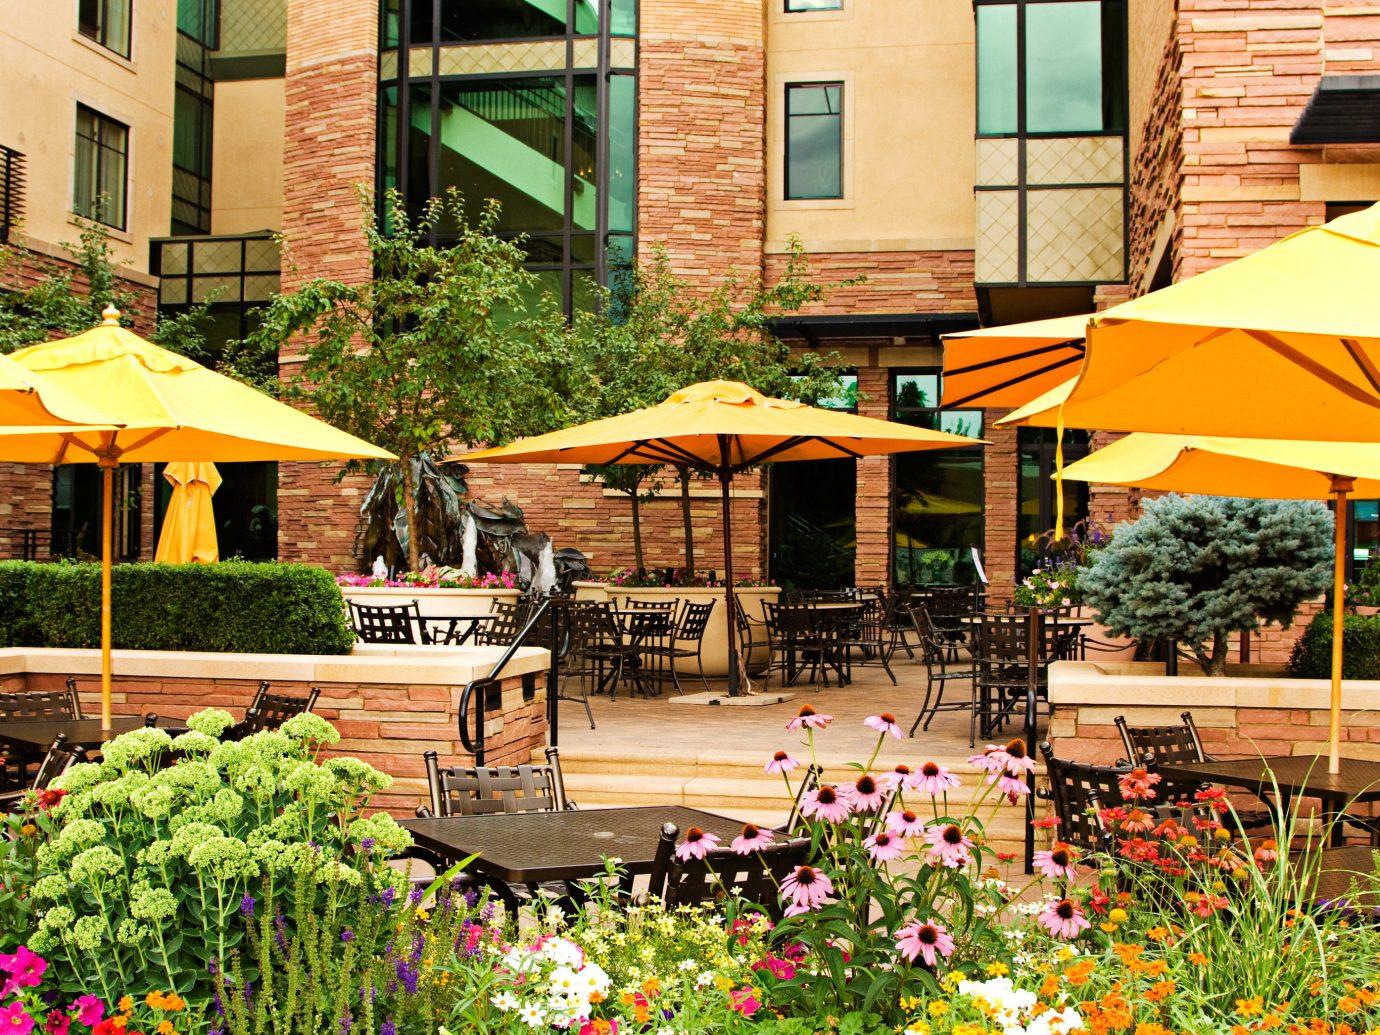 Classic Elegant Exterior Hotels Patio Resort Spa tree outdoor umbrella neighbourhood flower human settlement residential area Courtyard restaurant backyard Garden plant estate colorful area